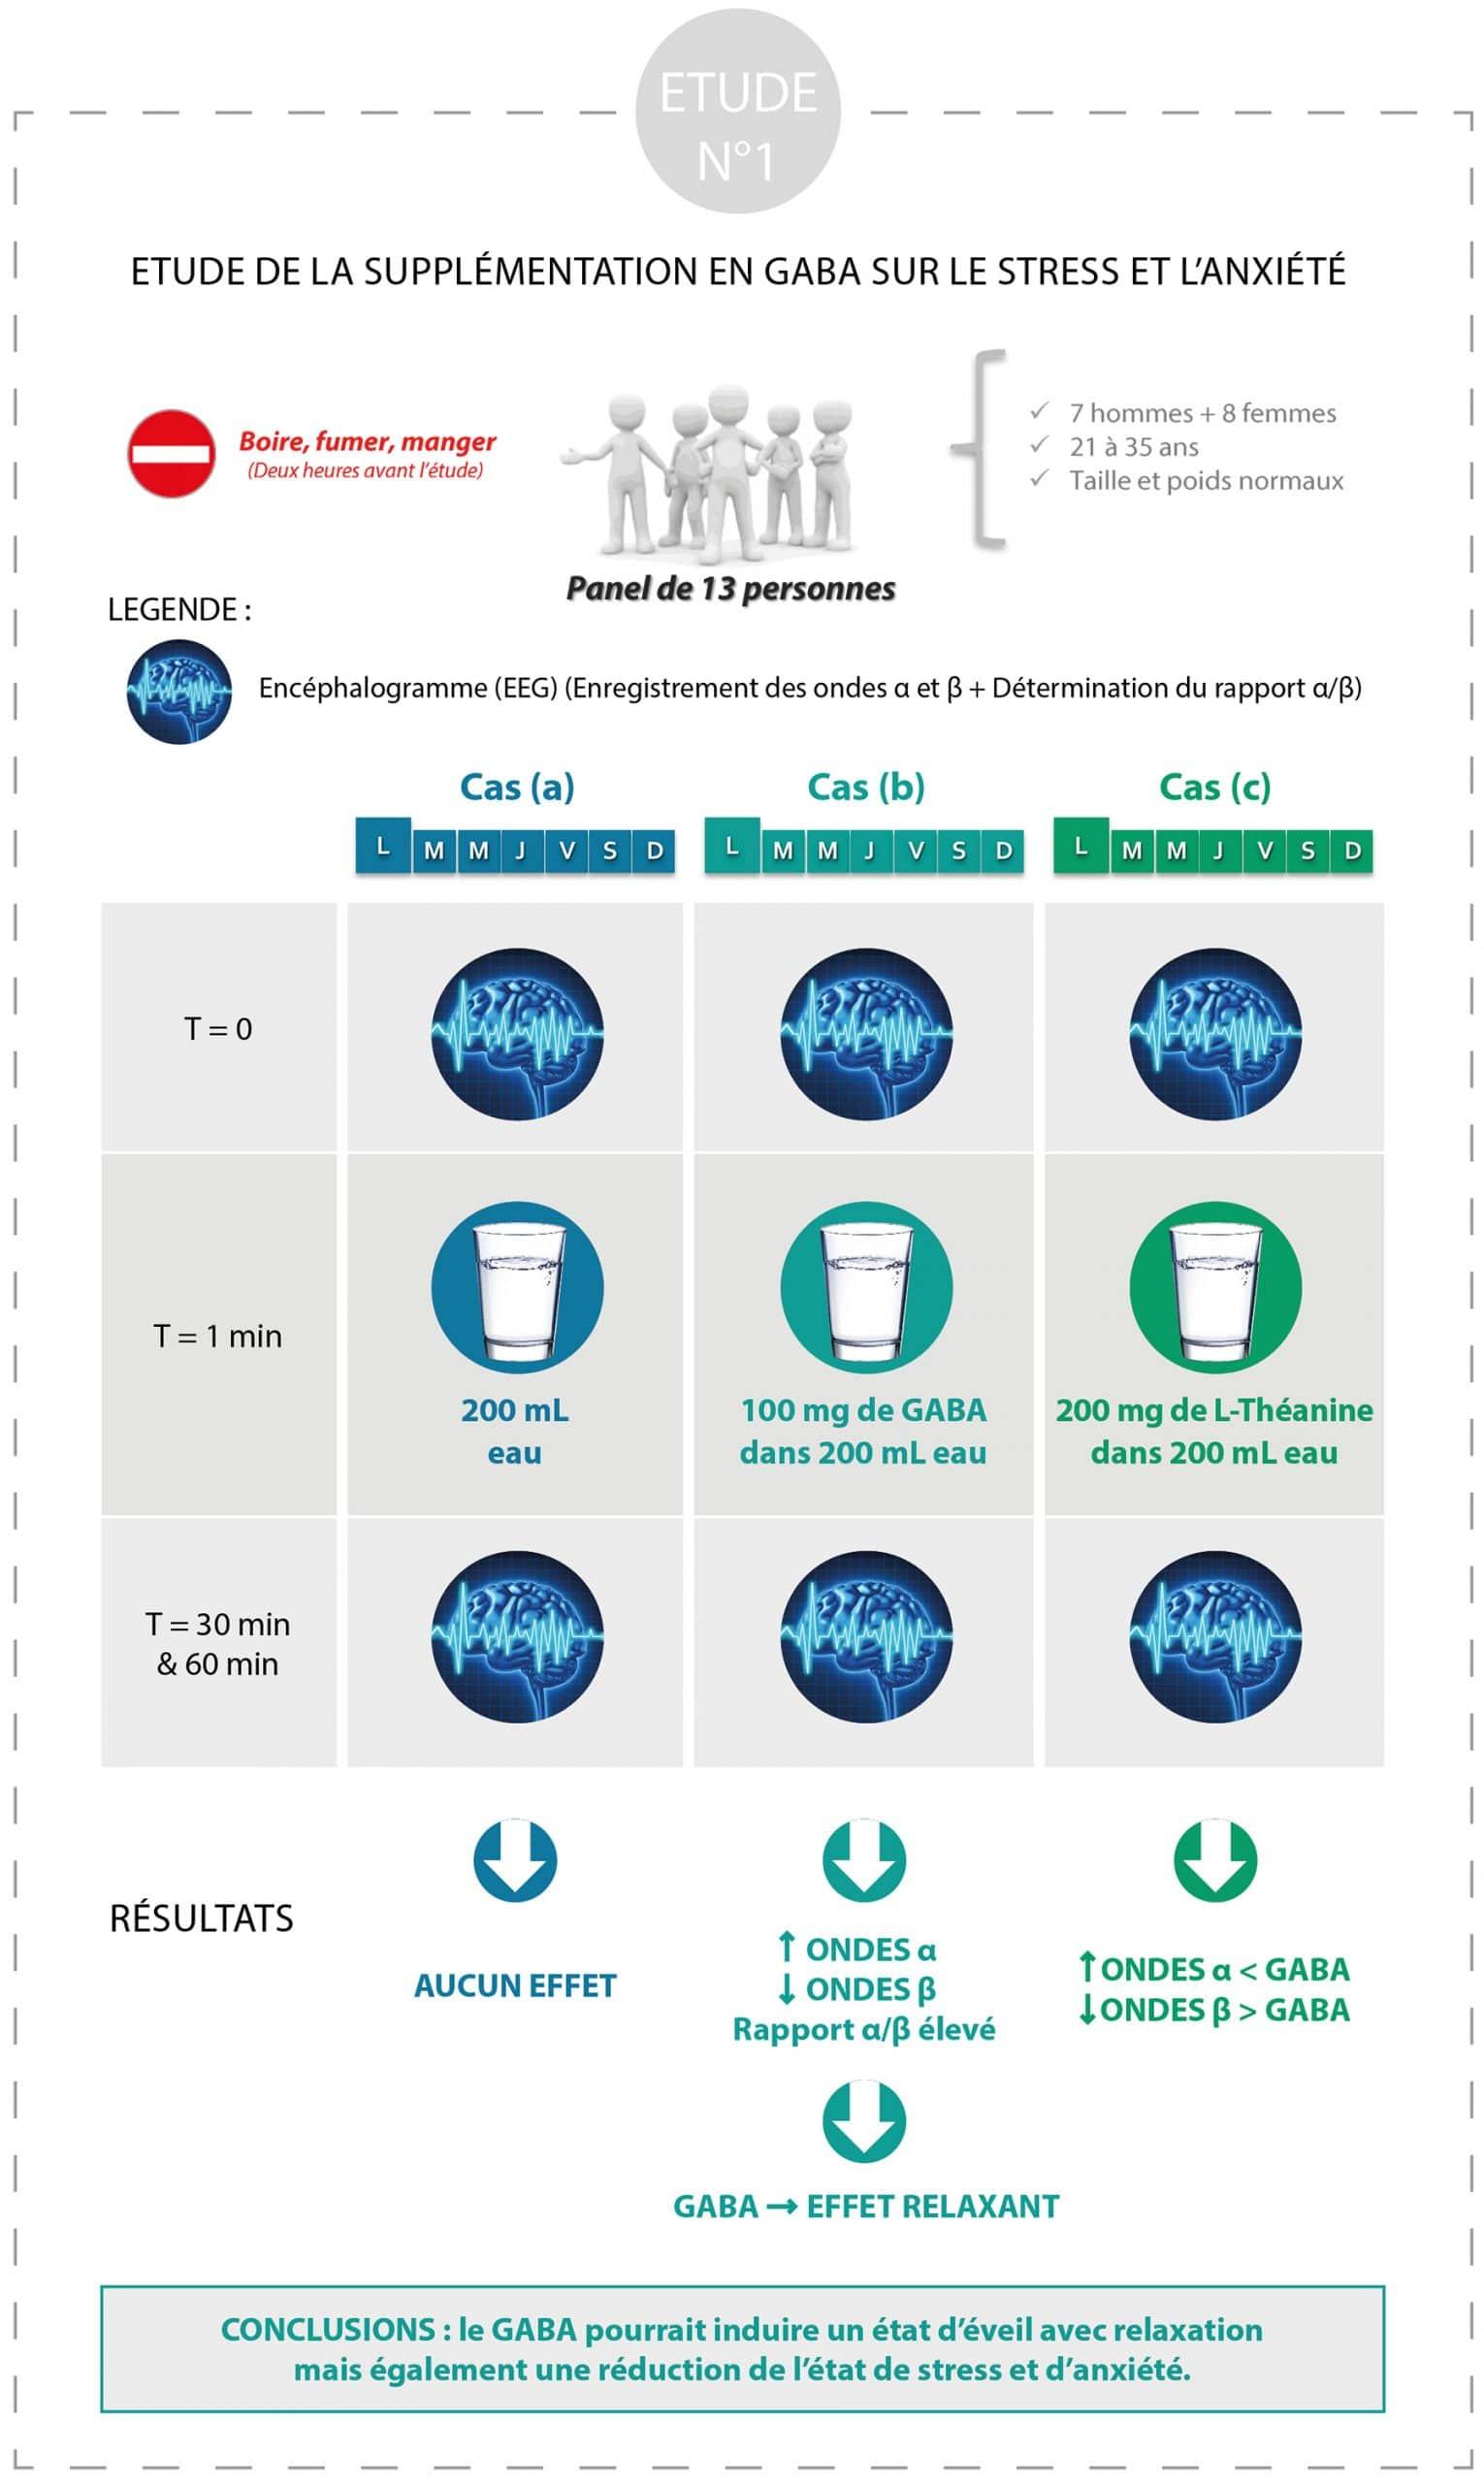 etude_de_cas_1_immunité_et_stress_nutrixeal-info